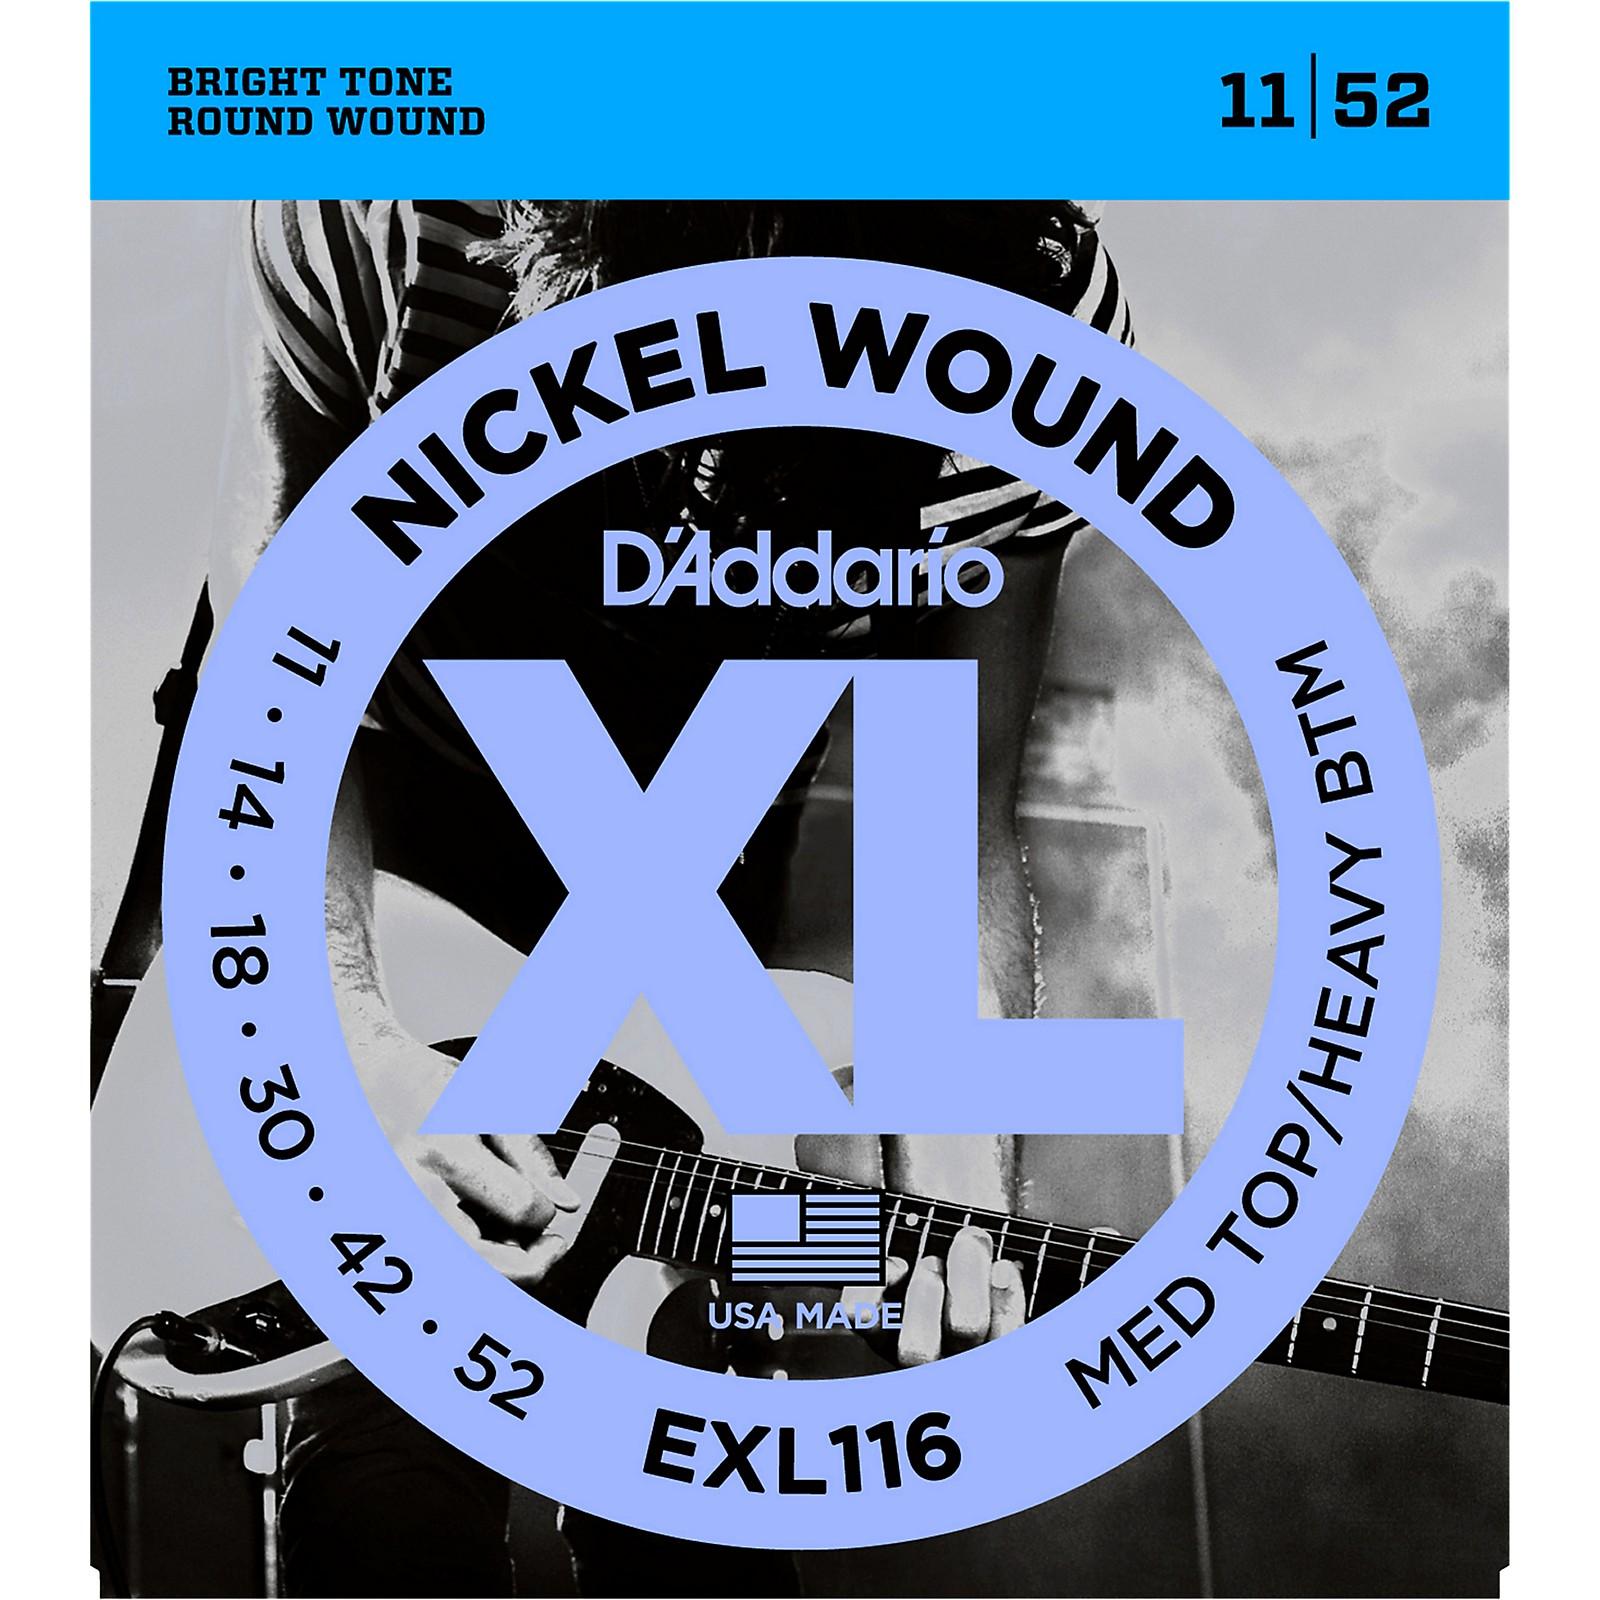 D'Addario EXL116 XL Electric Guitar Strings Medium Top/Heavy Bottom